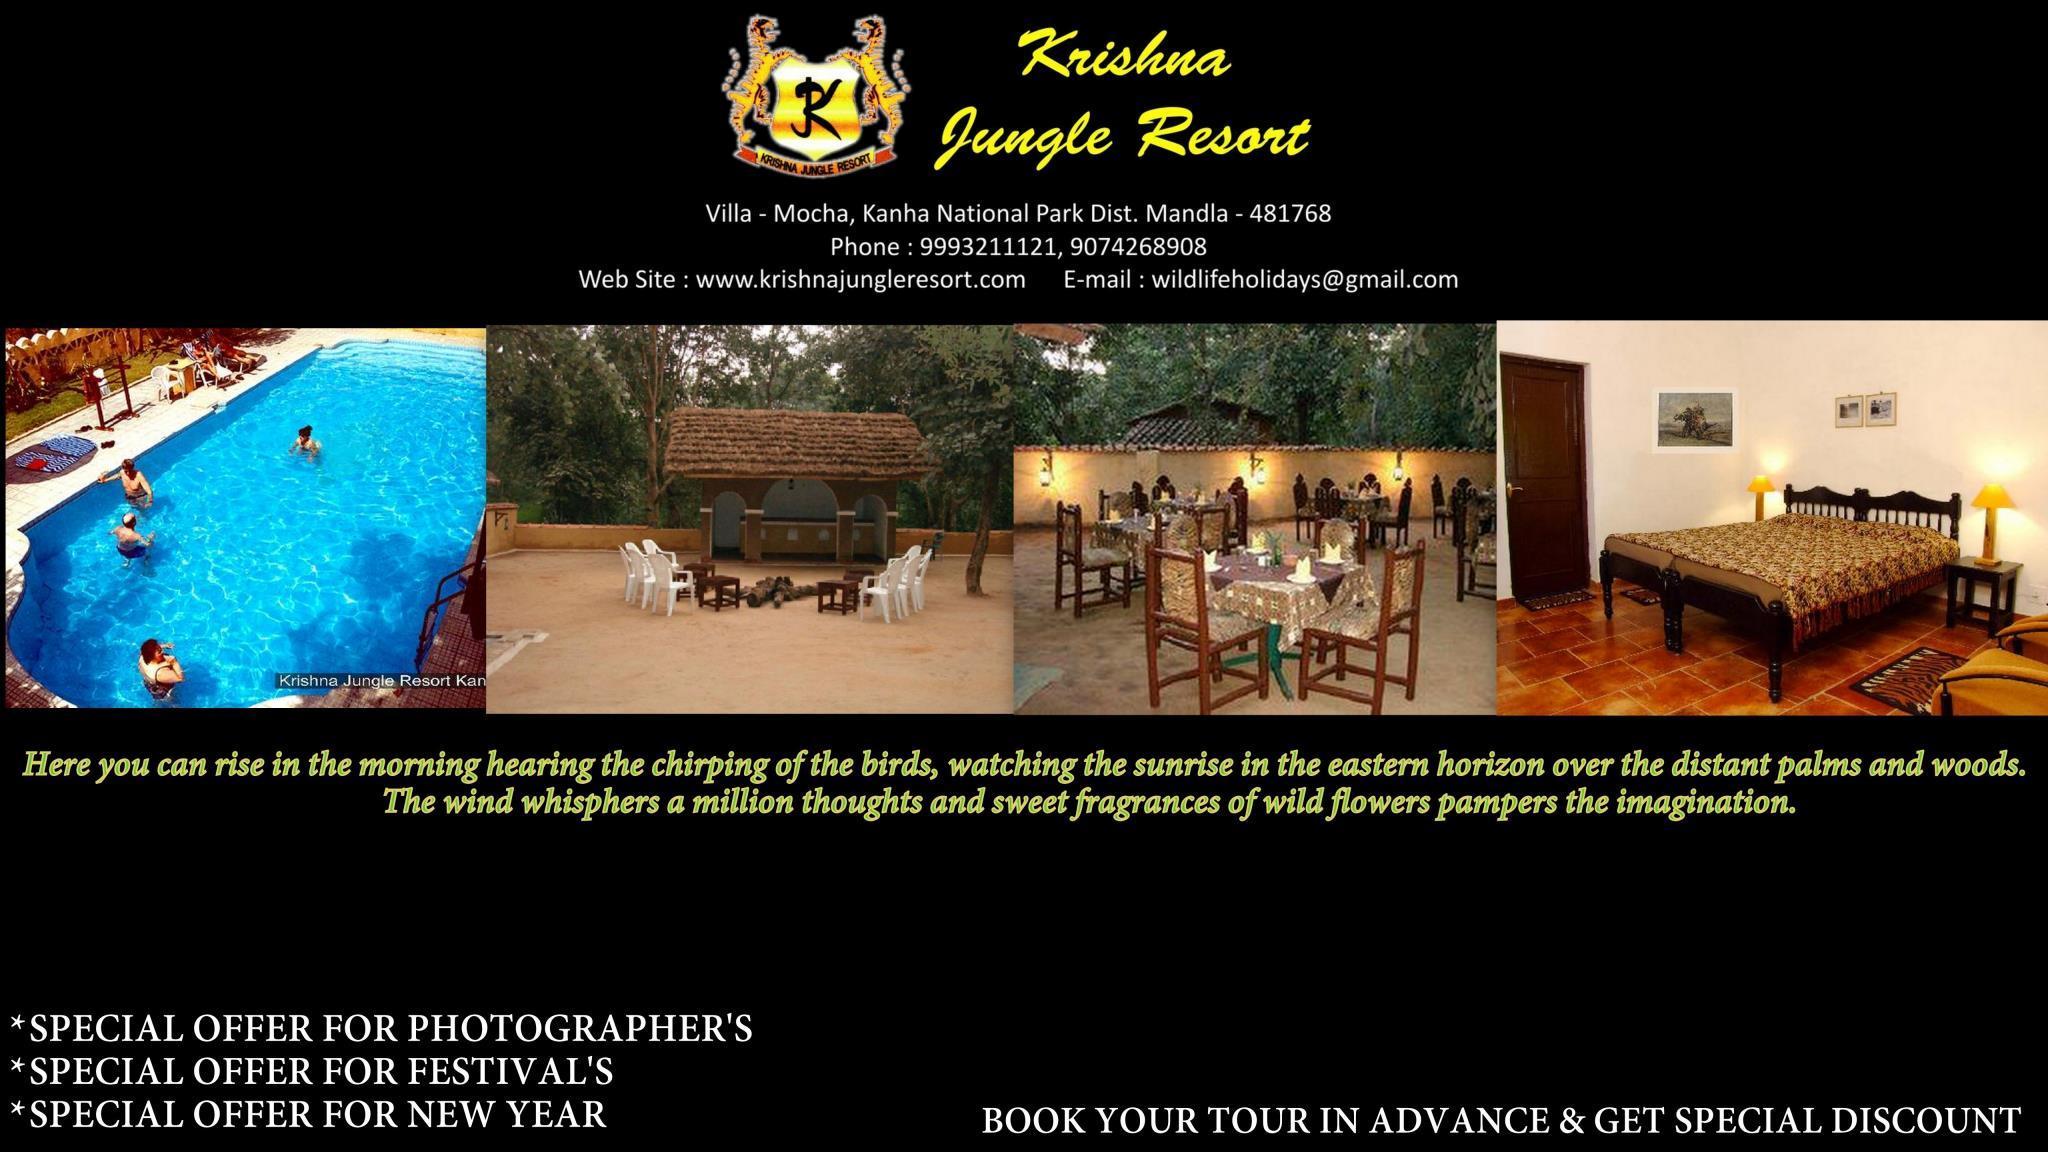 The Krishna Jungle Resorts